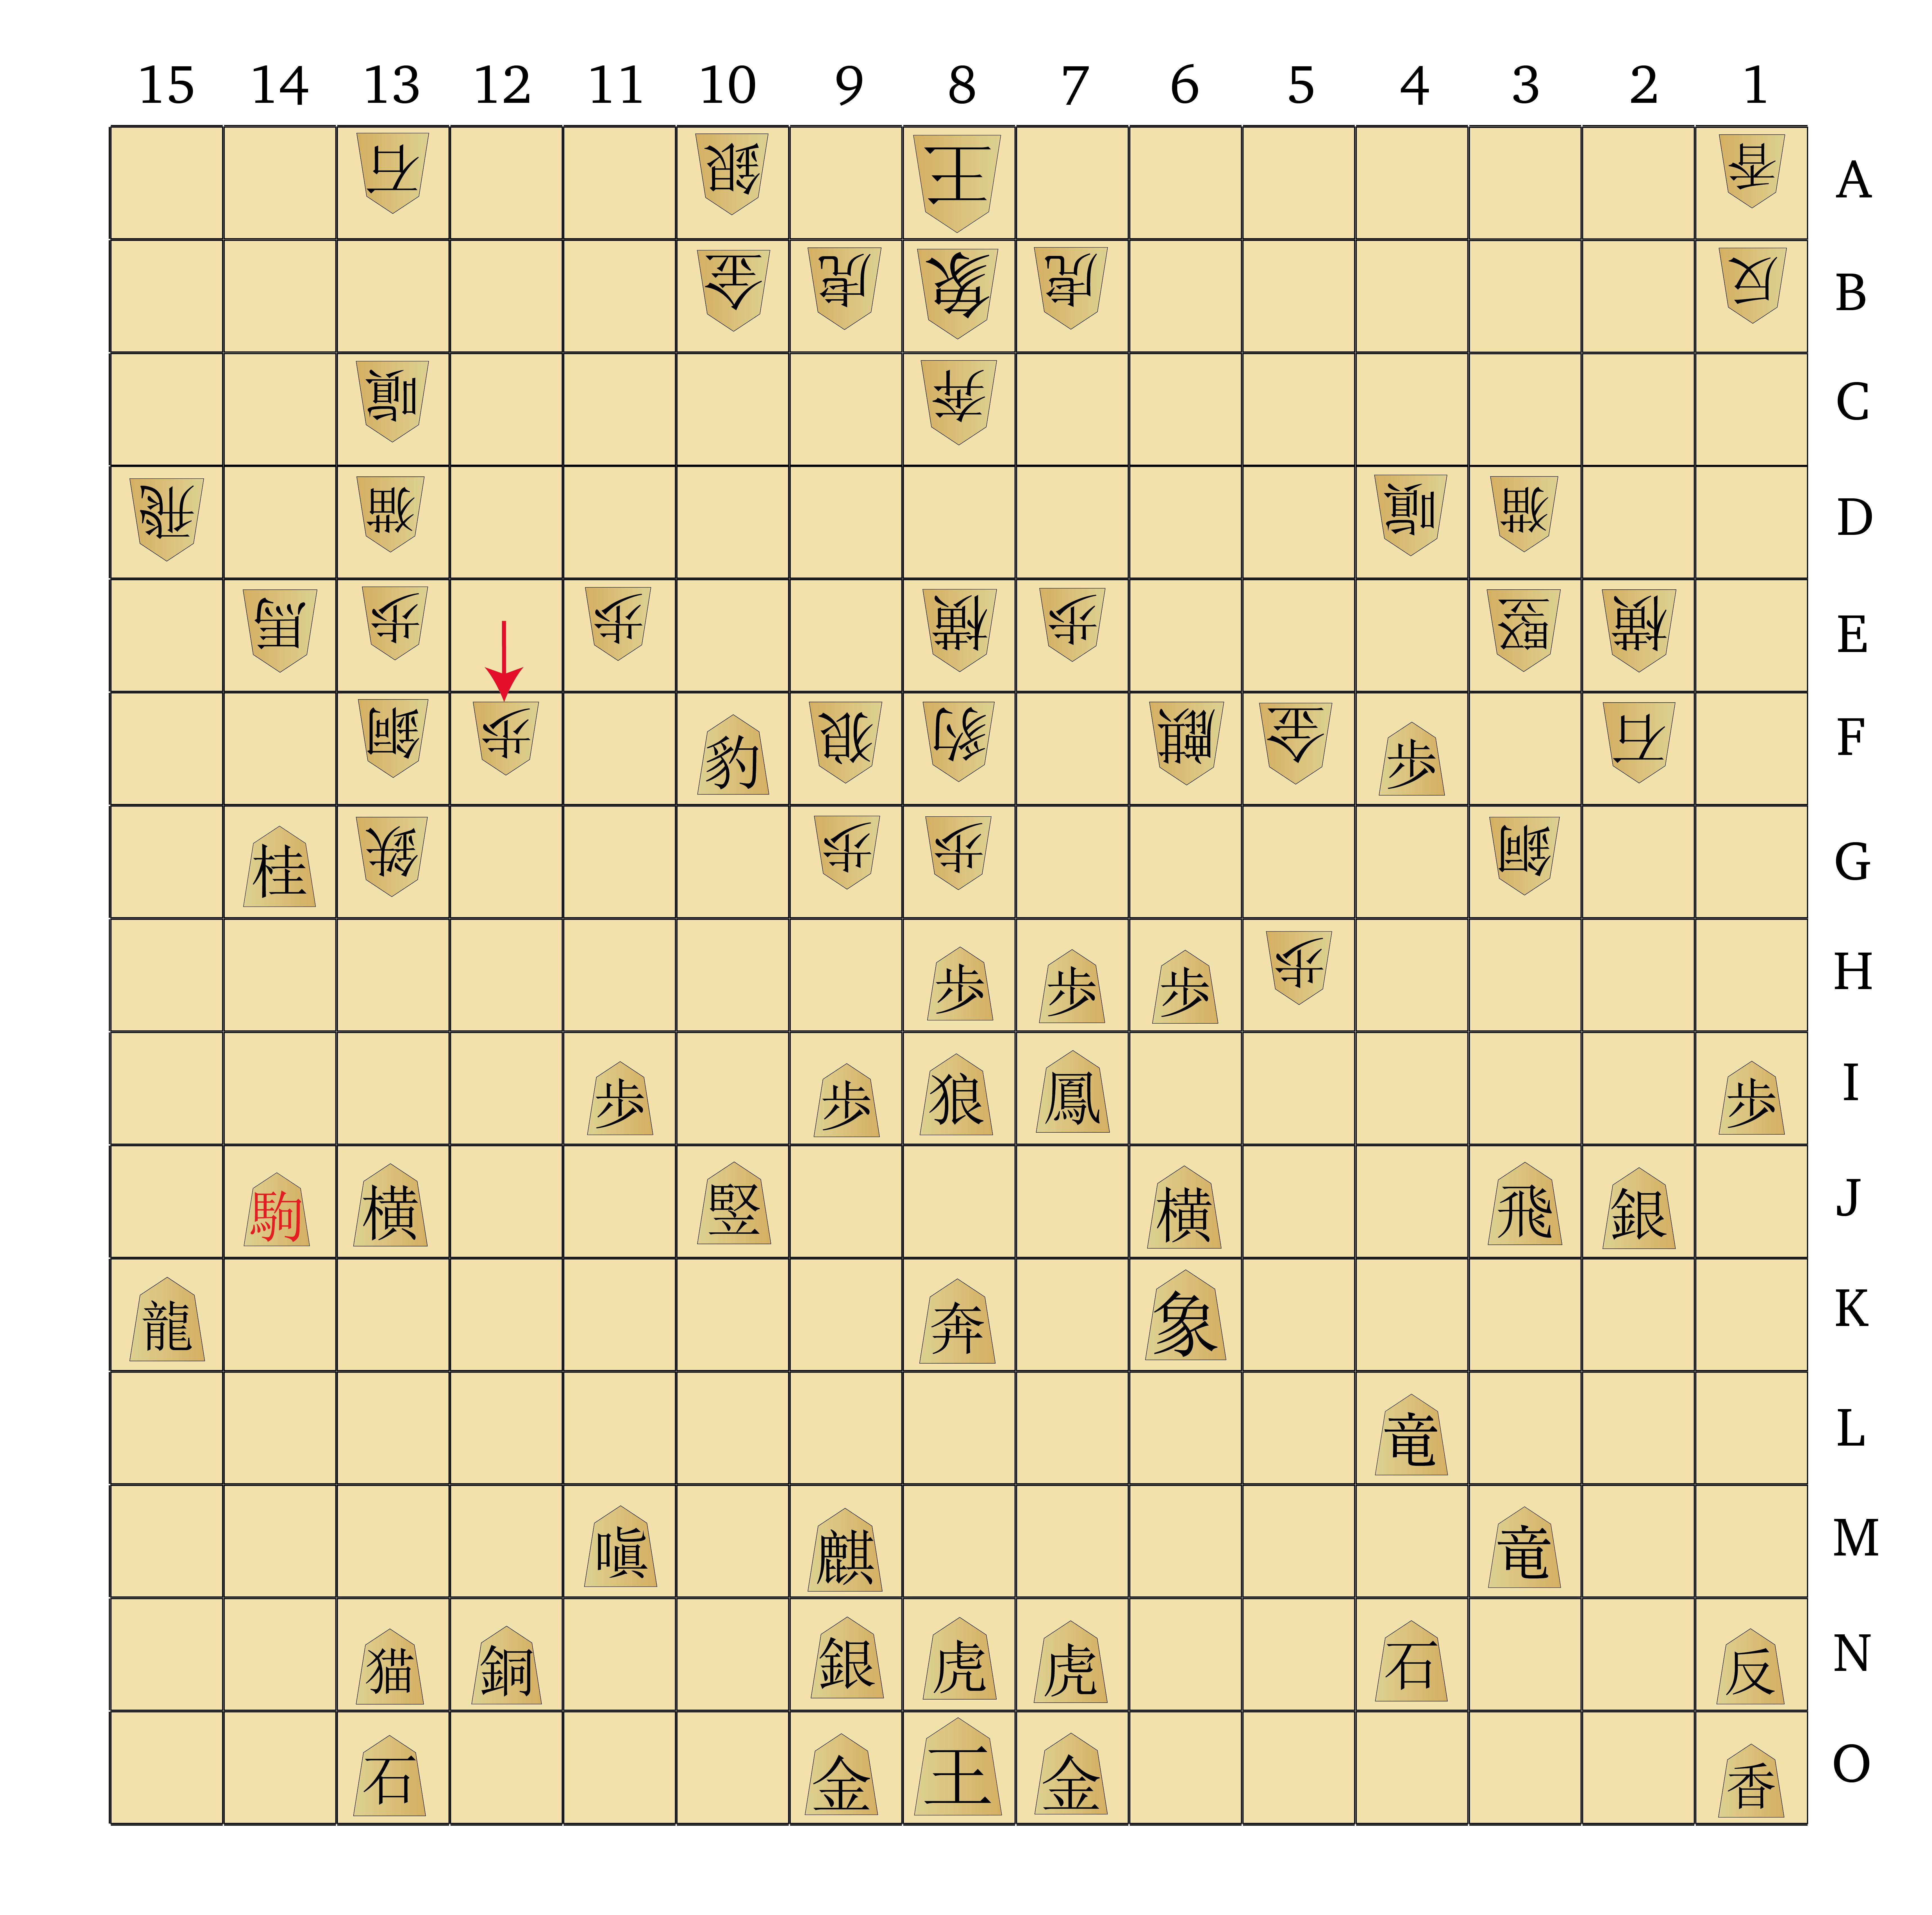 Dai Shogi 420 -- Move 390-01